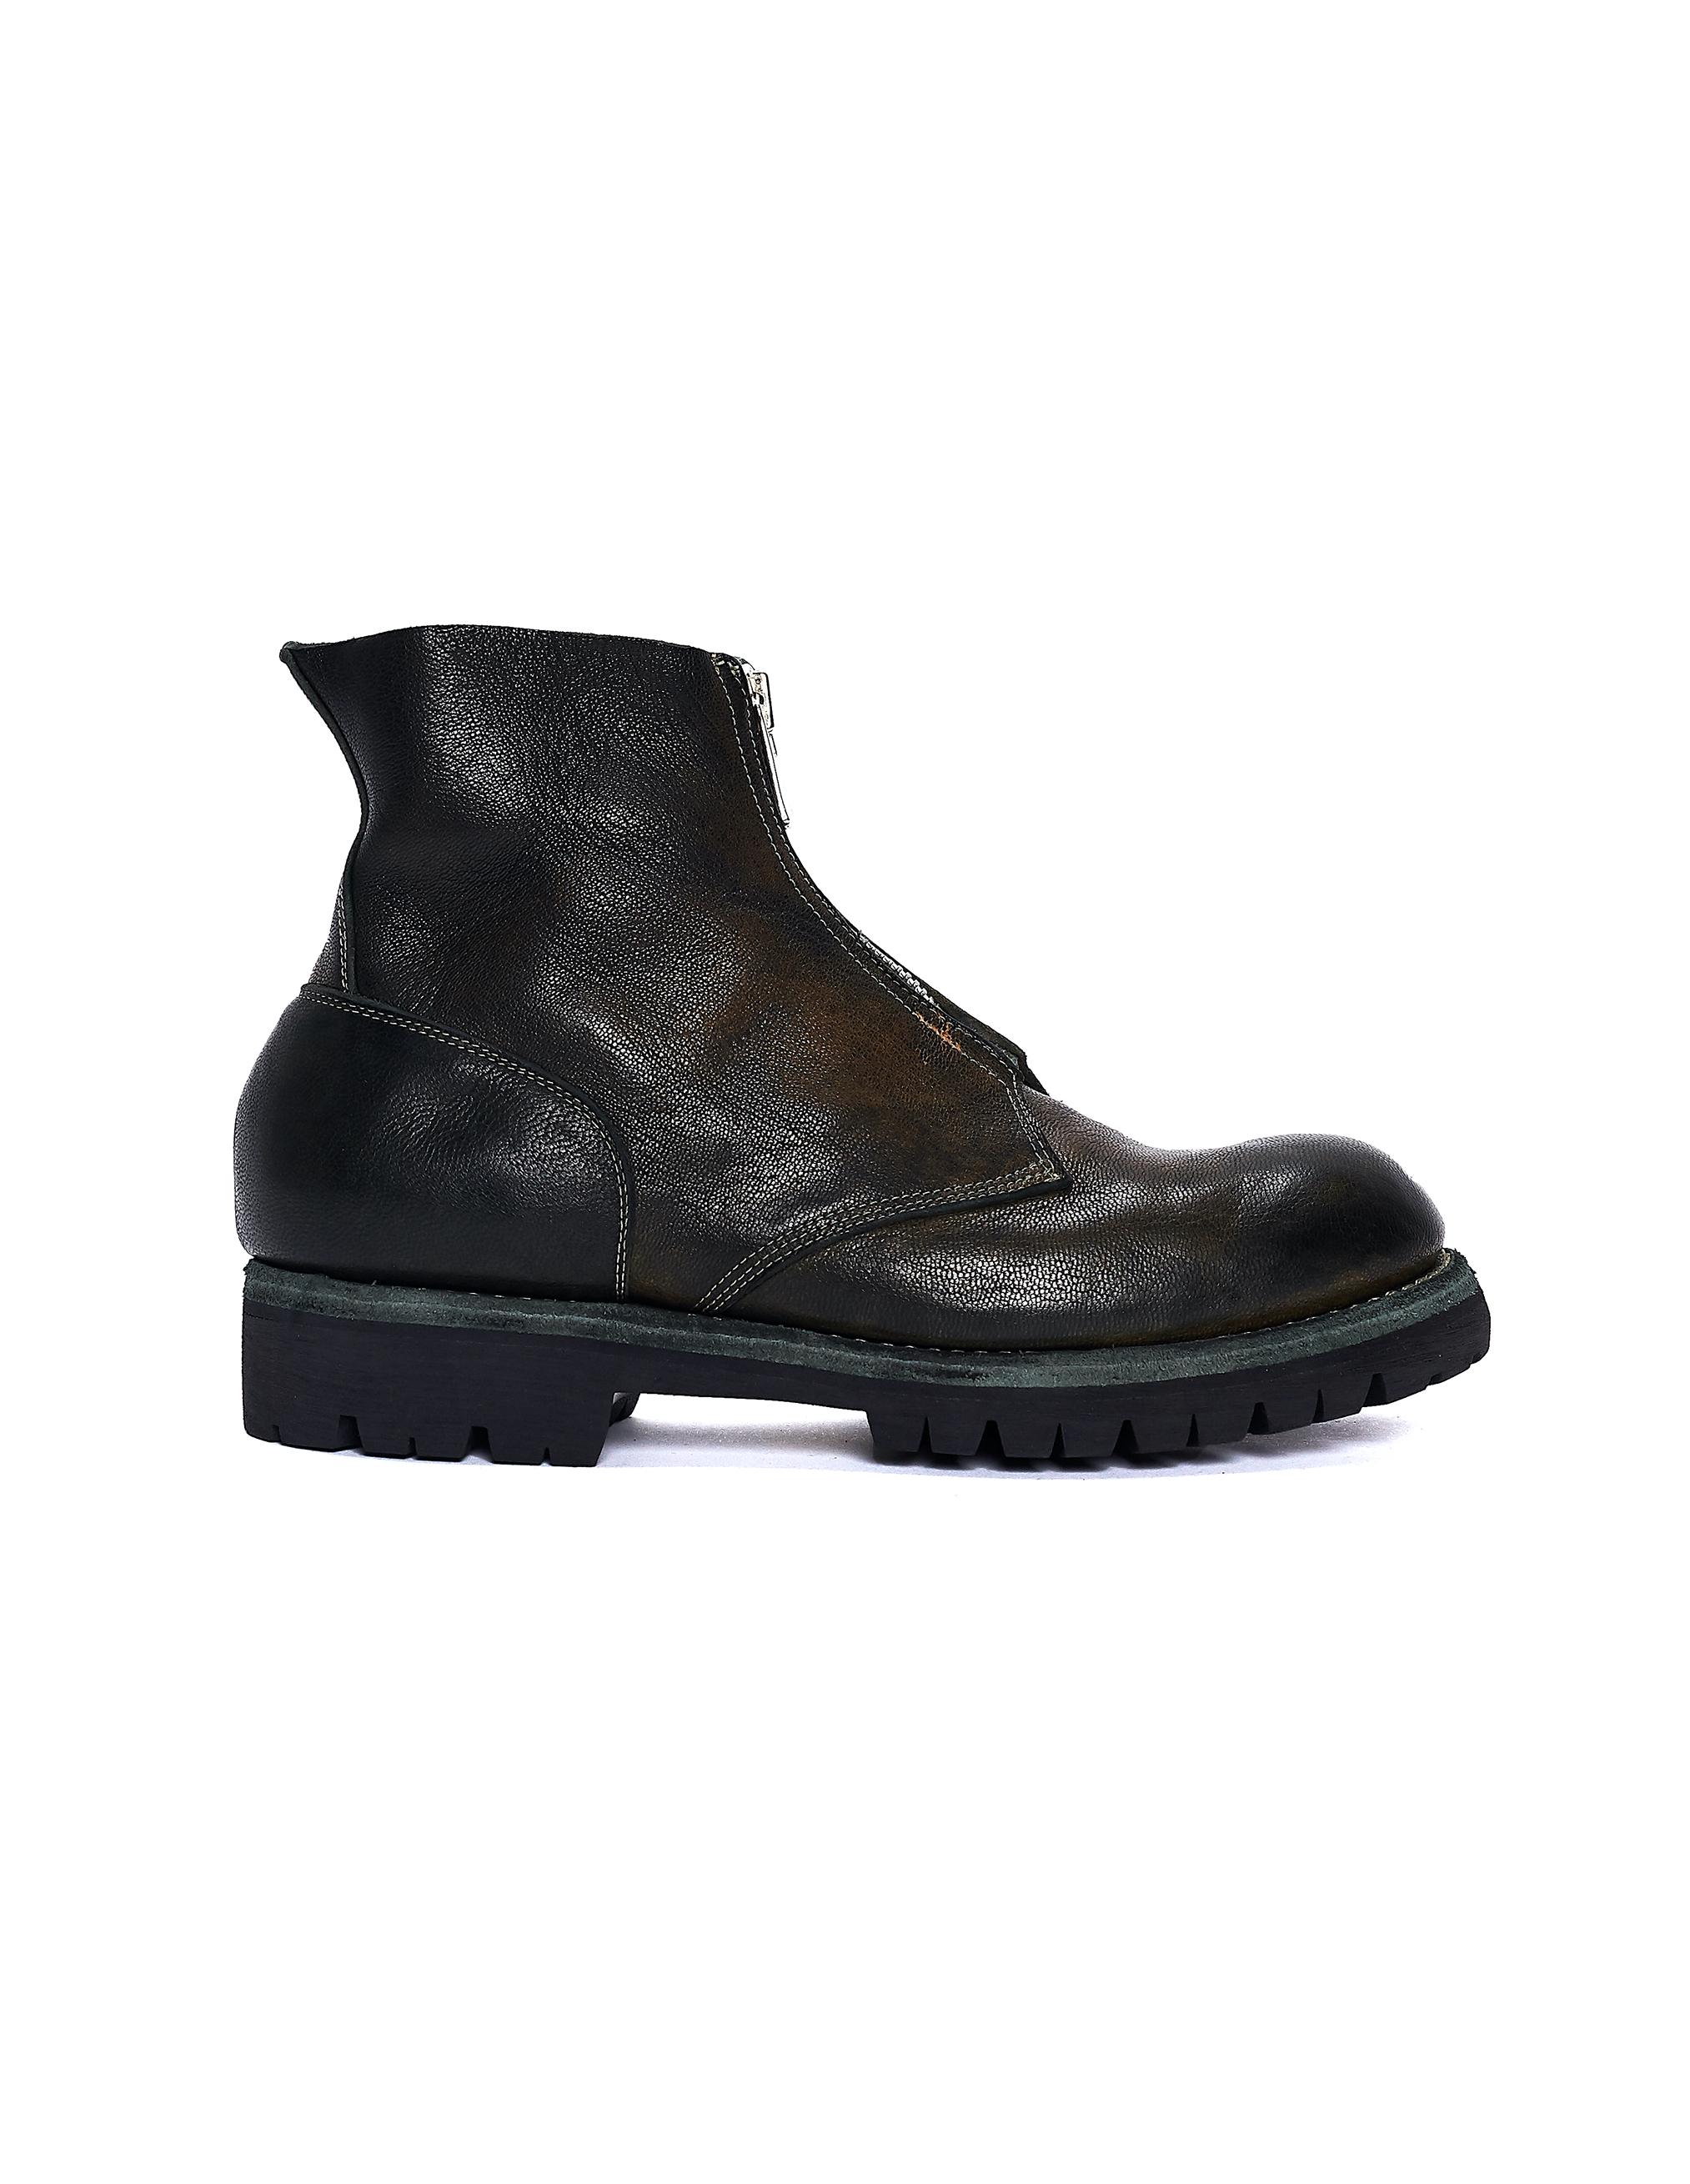 Guidi Green Leather Vibram Sole Zip Boots